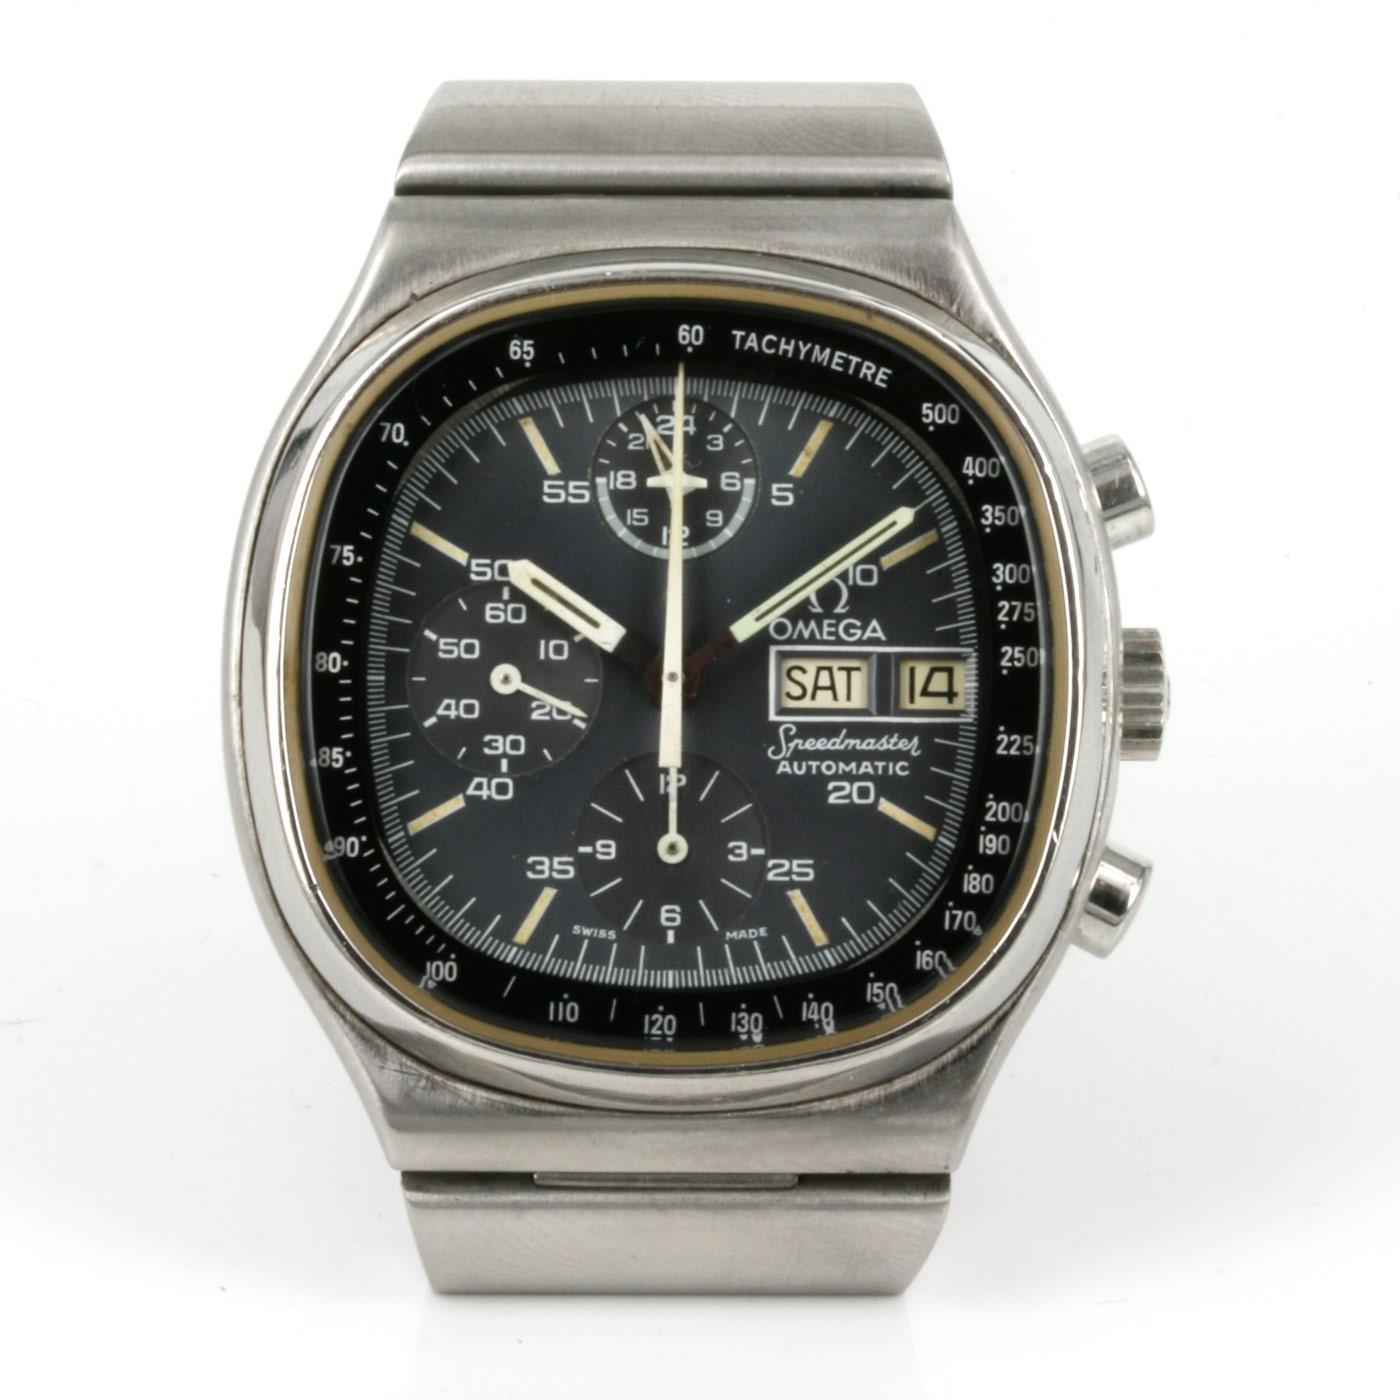 Buy 1975 Omega Speedmaster Mark IV Sold Items, Sold Omega ...